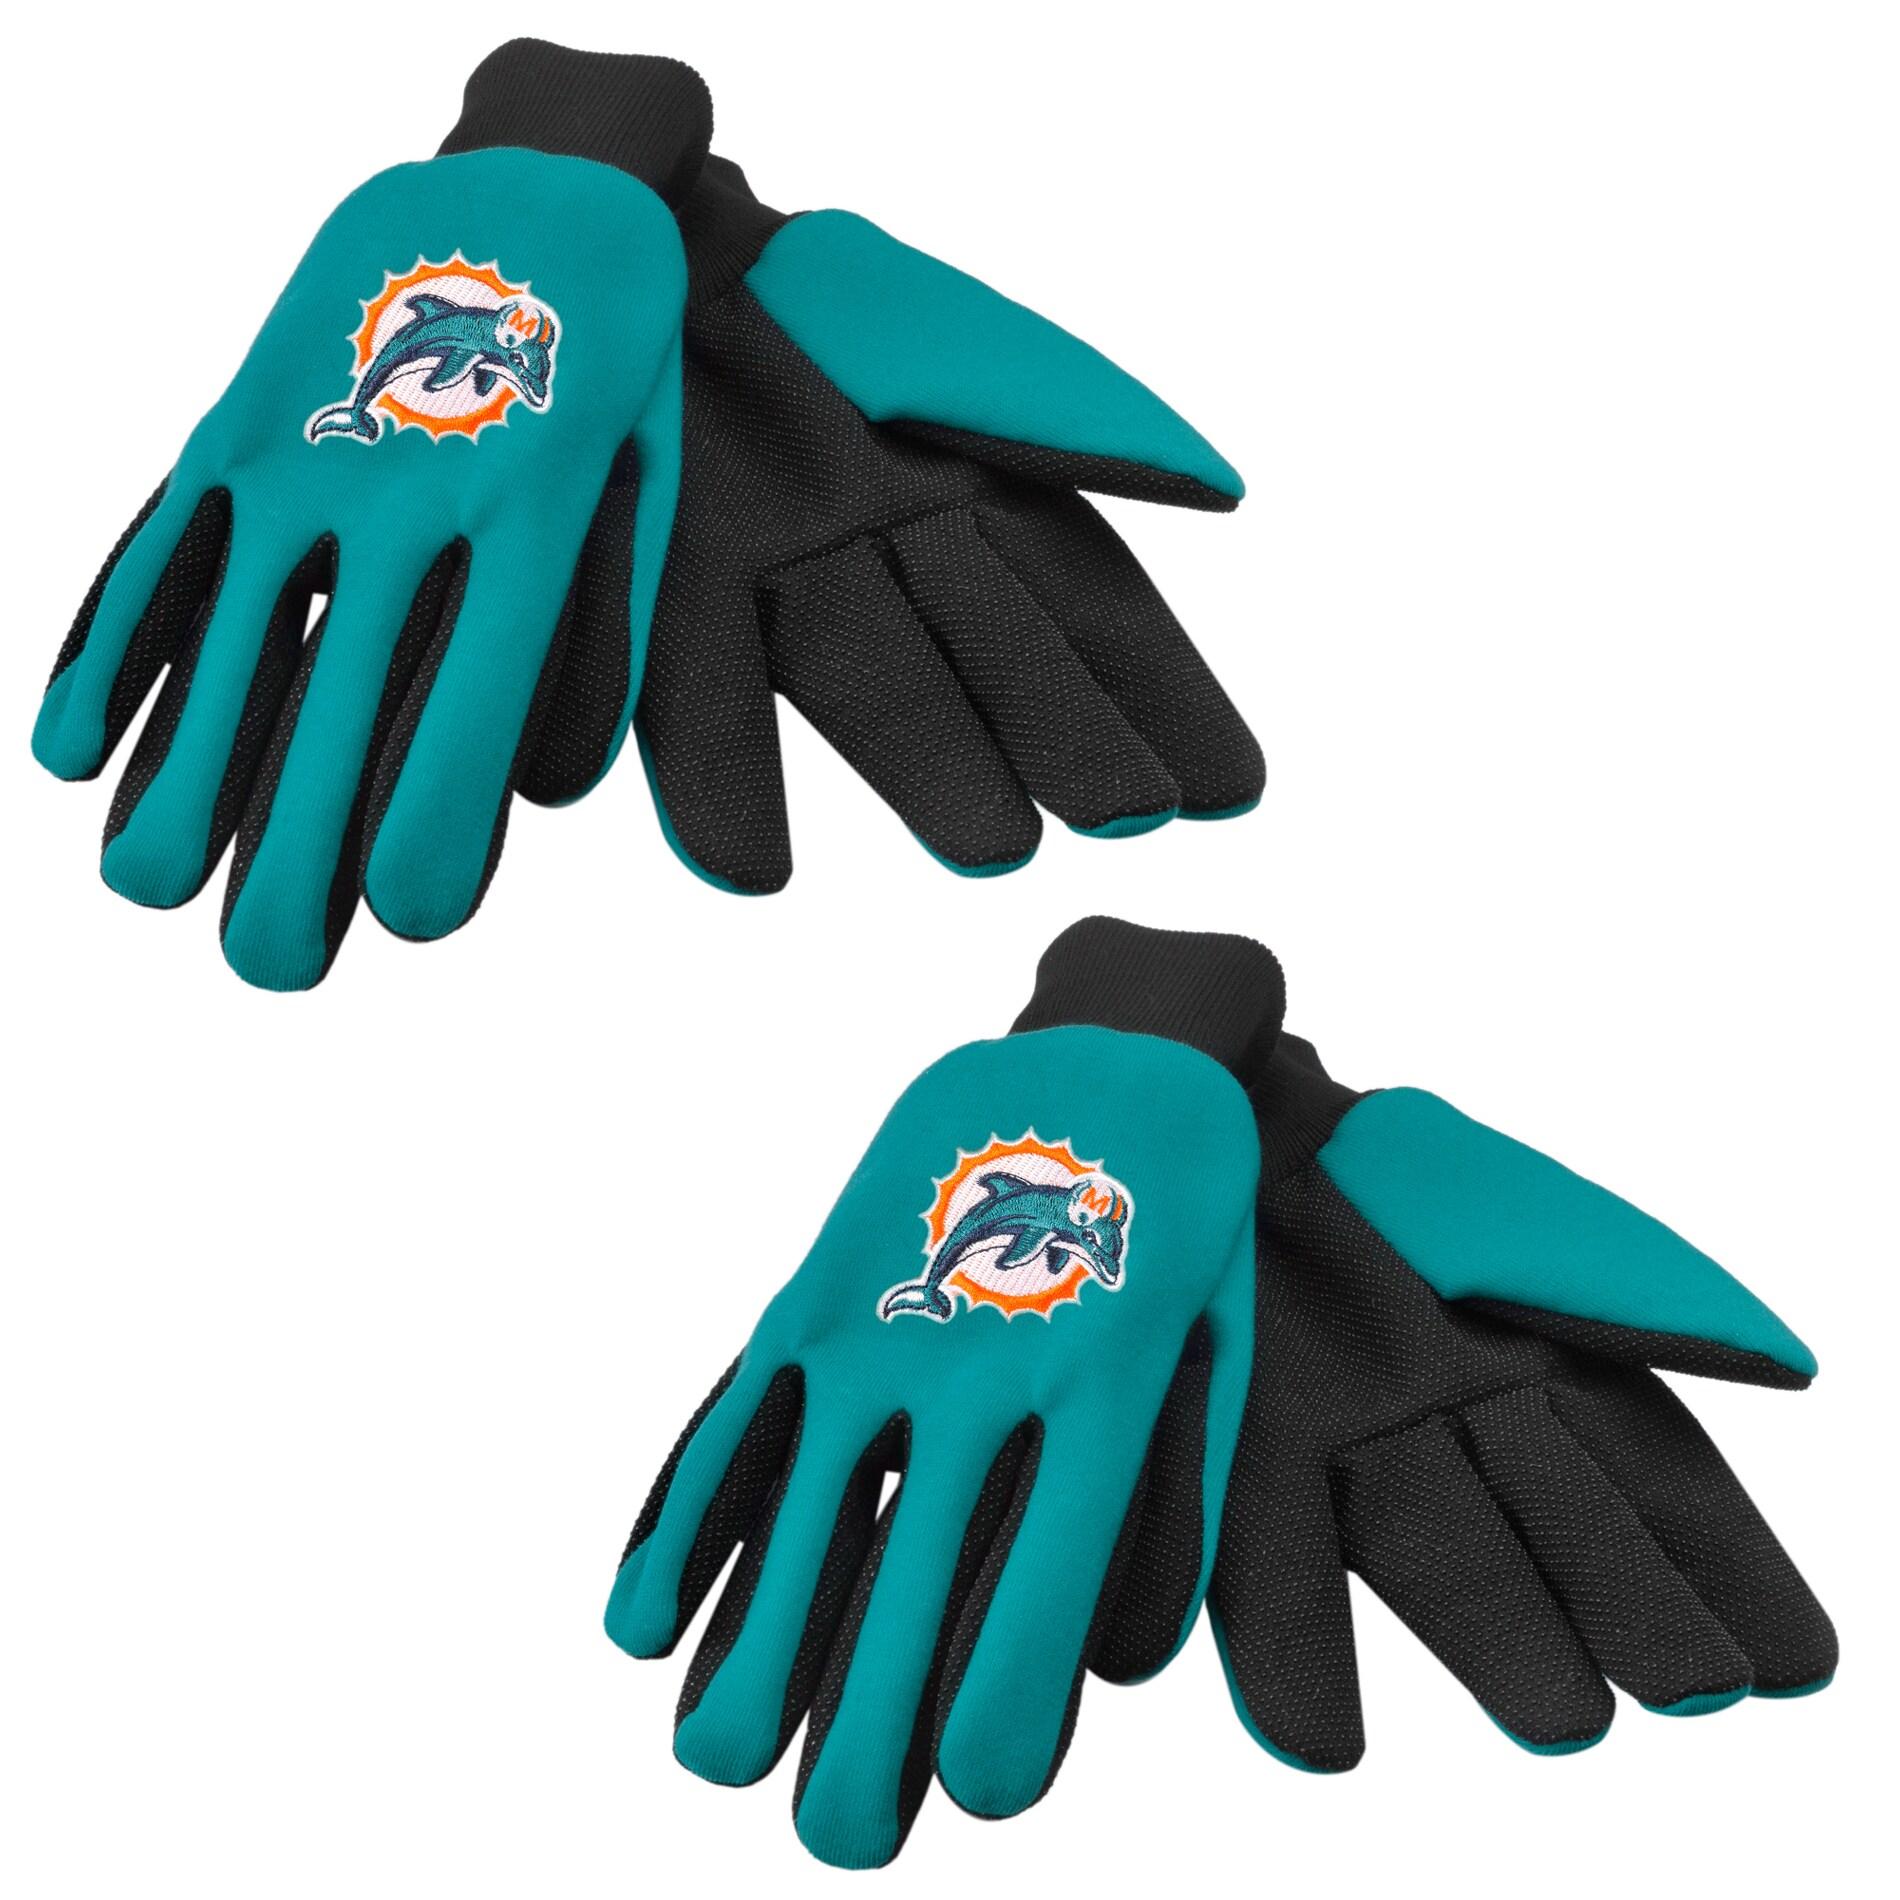 Miami Dolphins Two-tone Work Gloves (Set of 2 Pair)